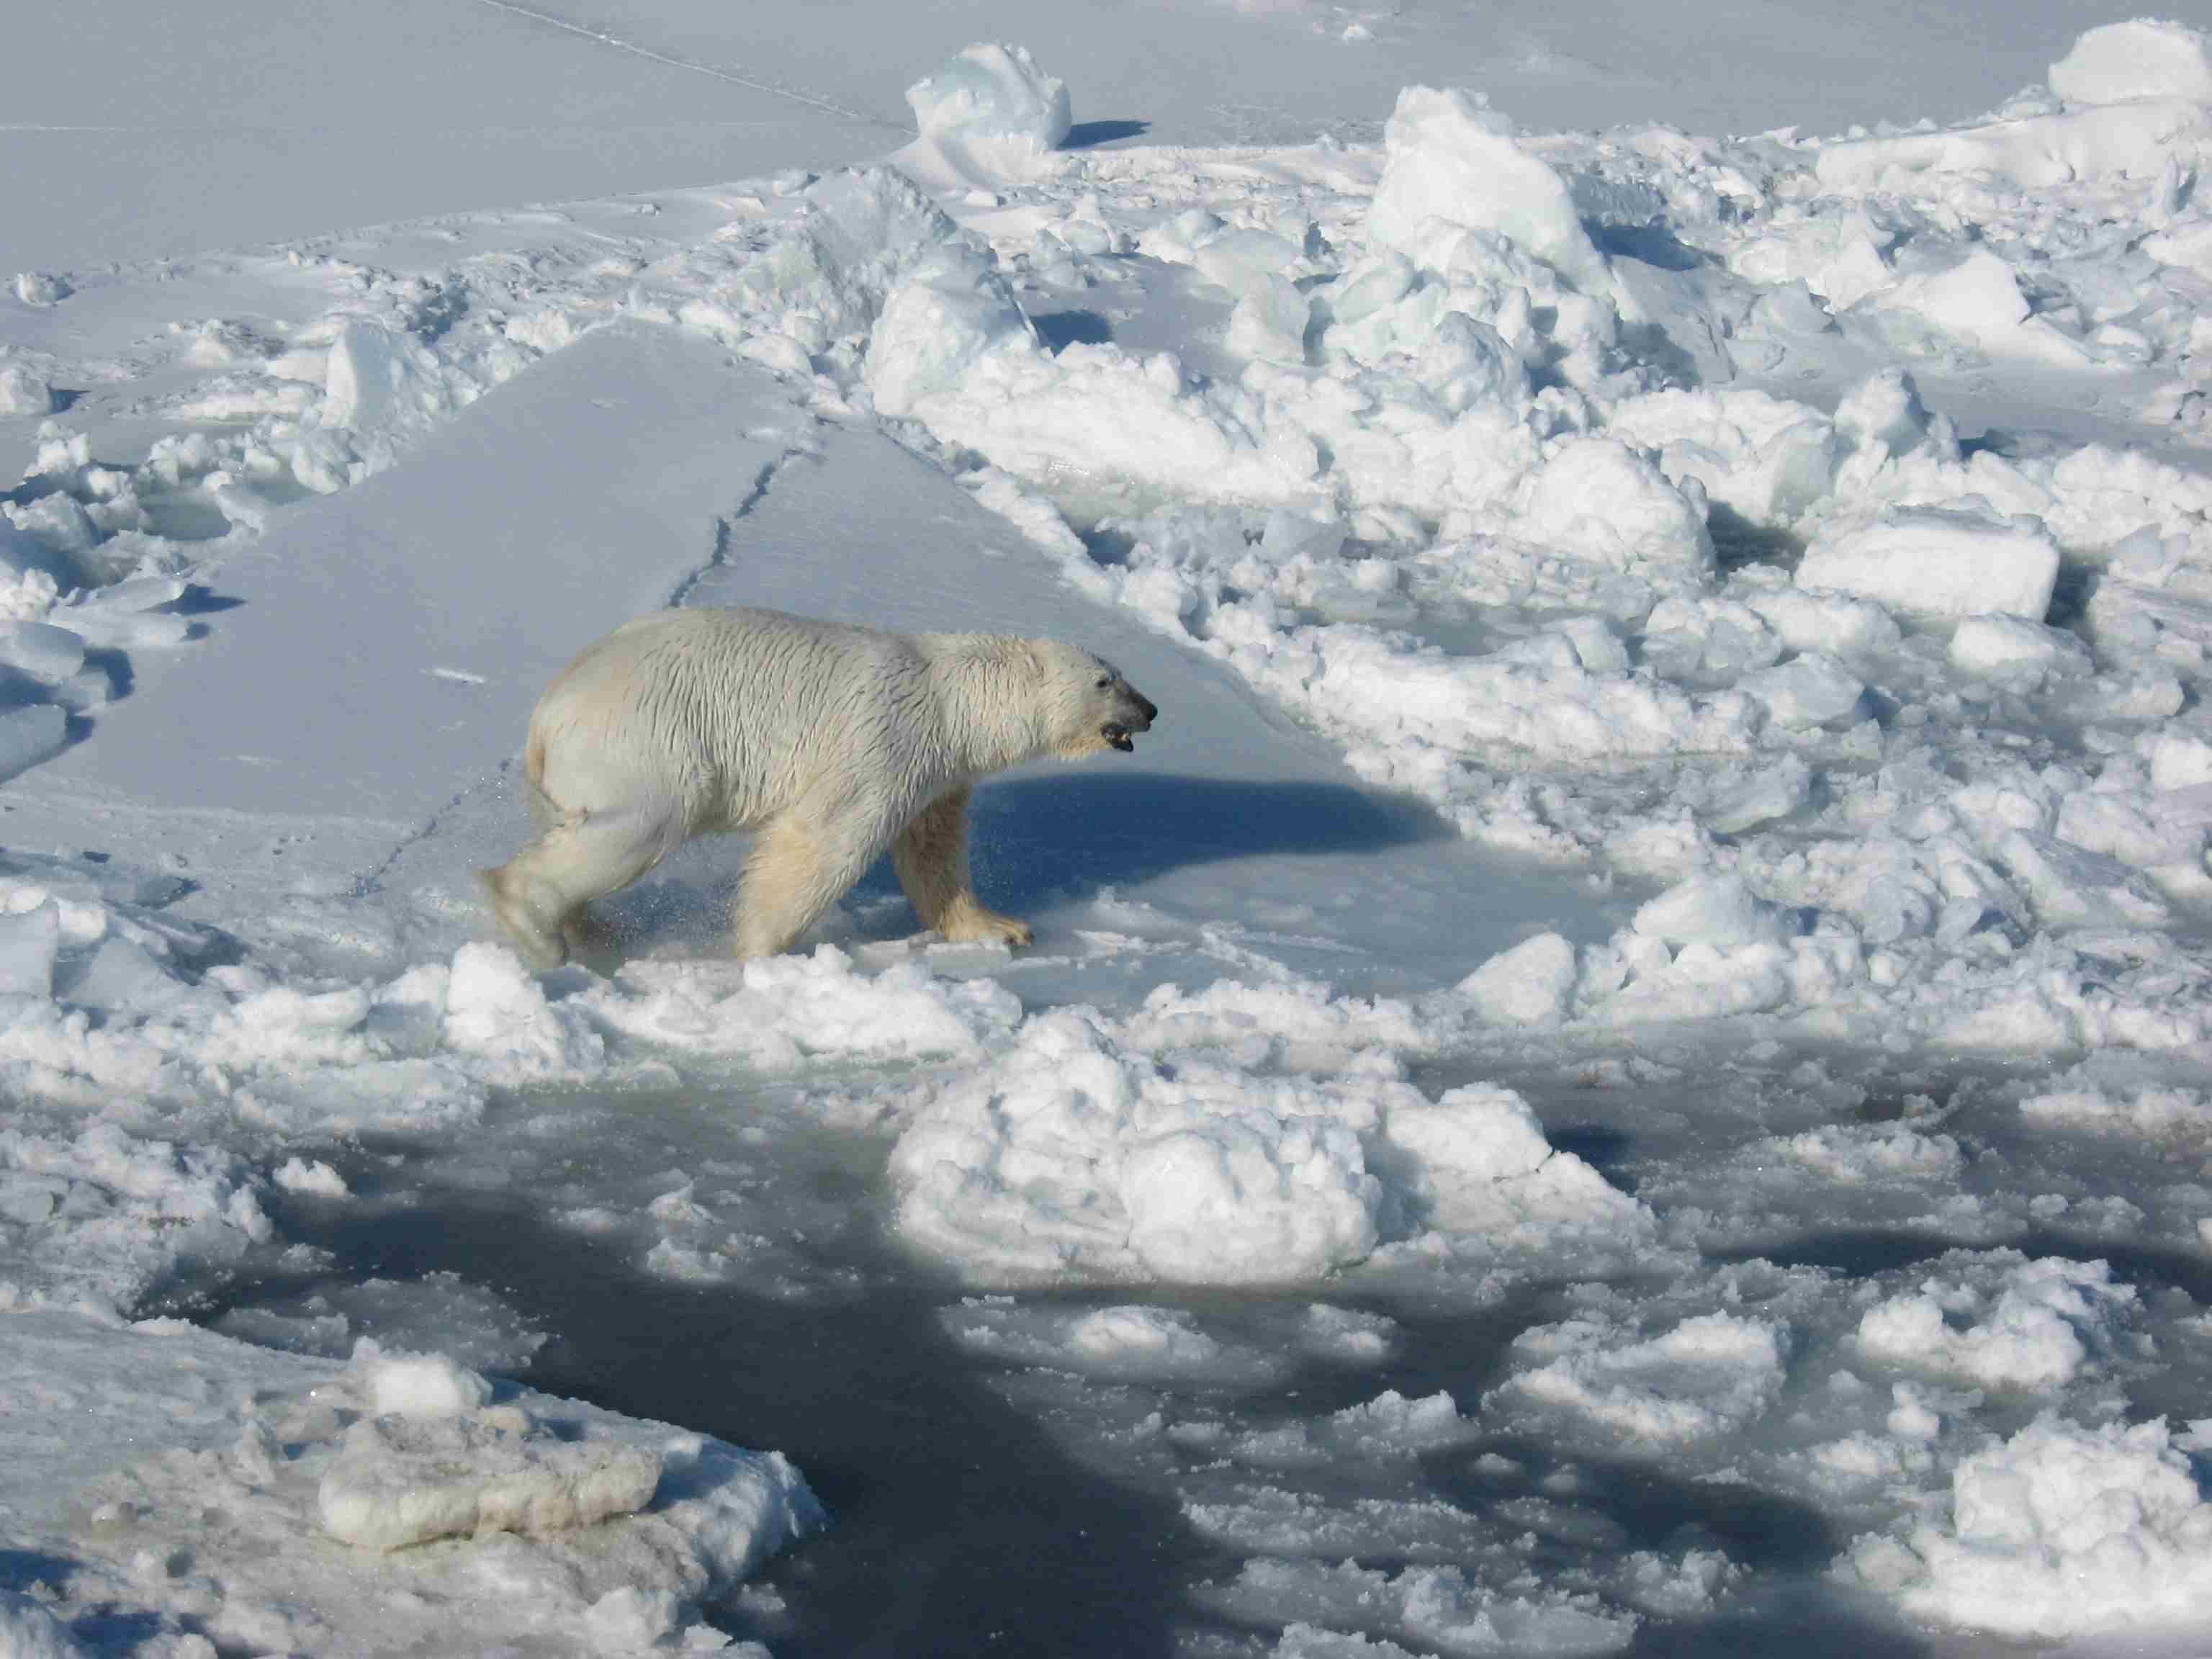 Polar_Bear_male on sea ice_Regehr photo_March 21 2010_lg